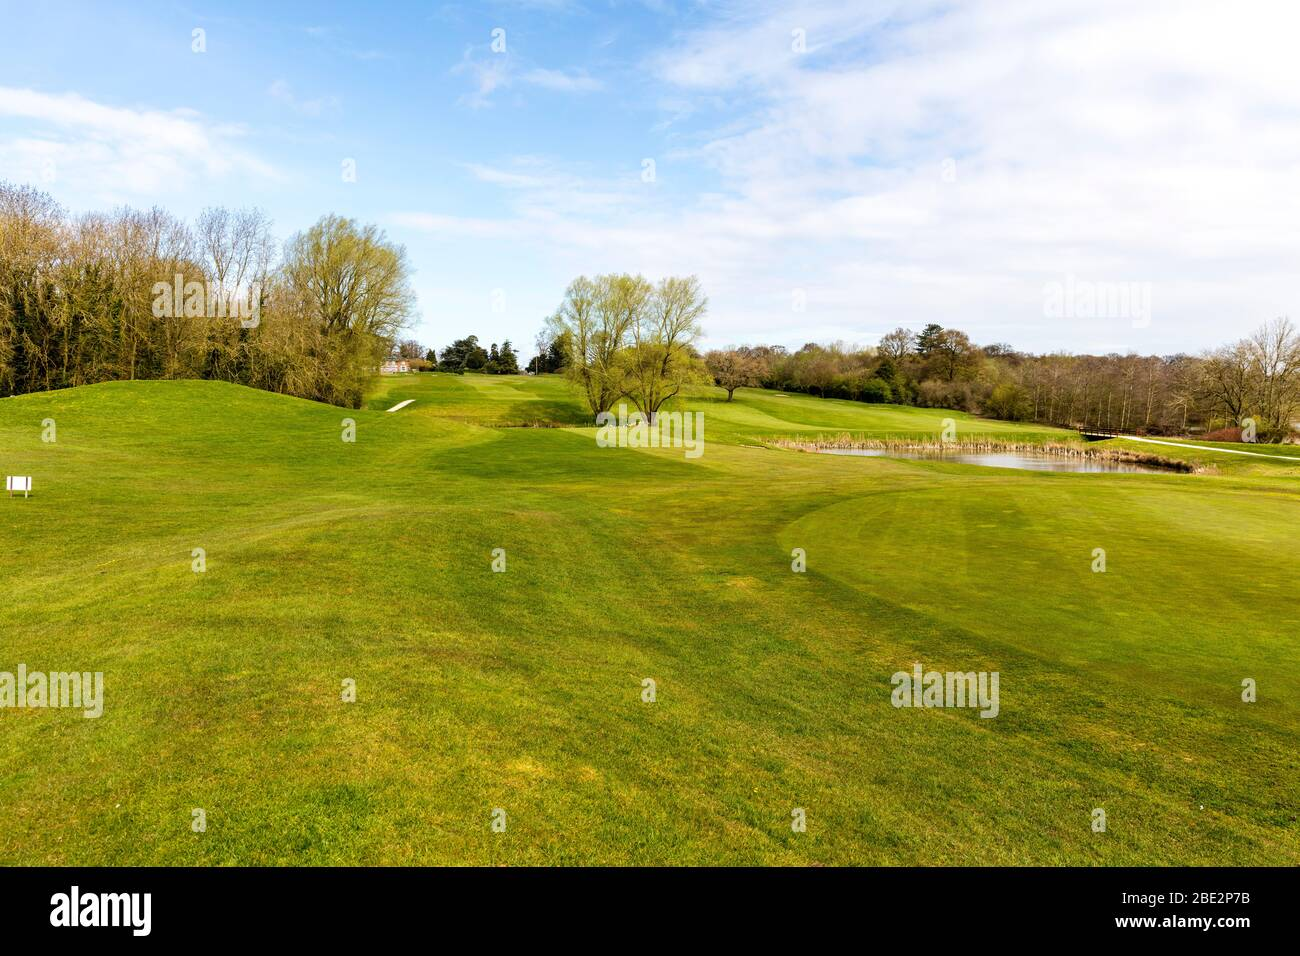 Kenwick golf course Louth, campo de golf, golf, golf, golf green, golf green, campos de golf, Kenwick, Kenwick Louth, greens, Foto de stock